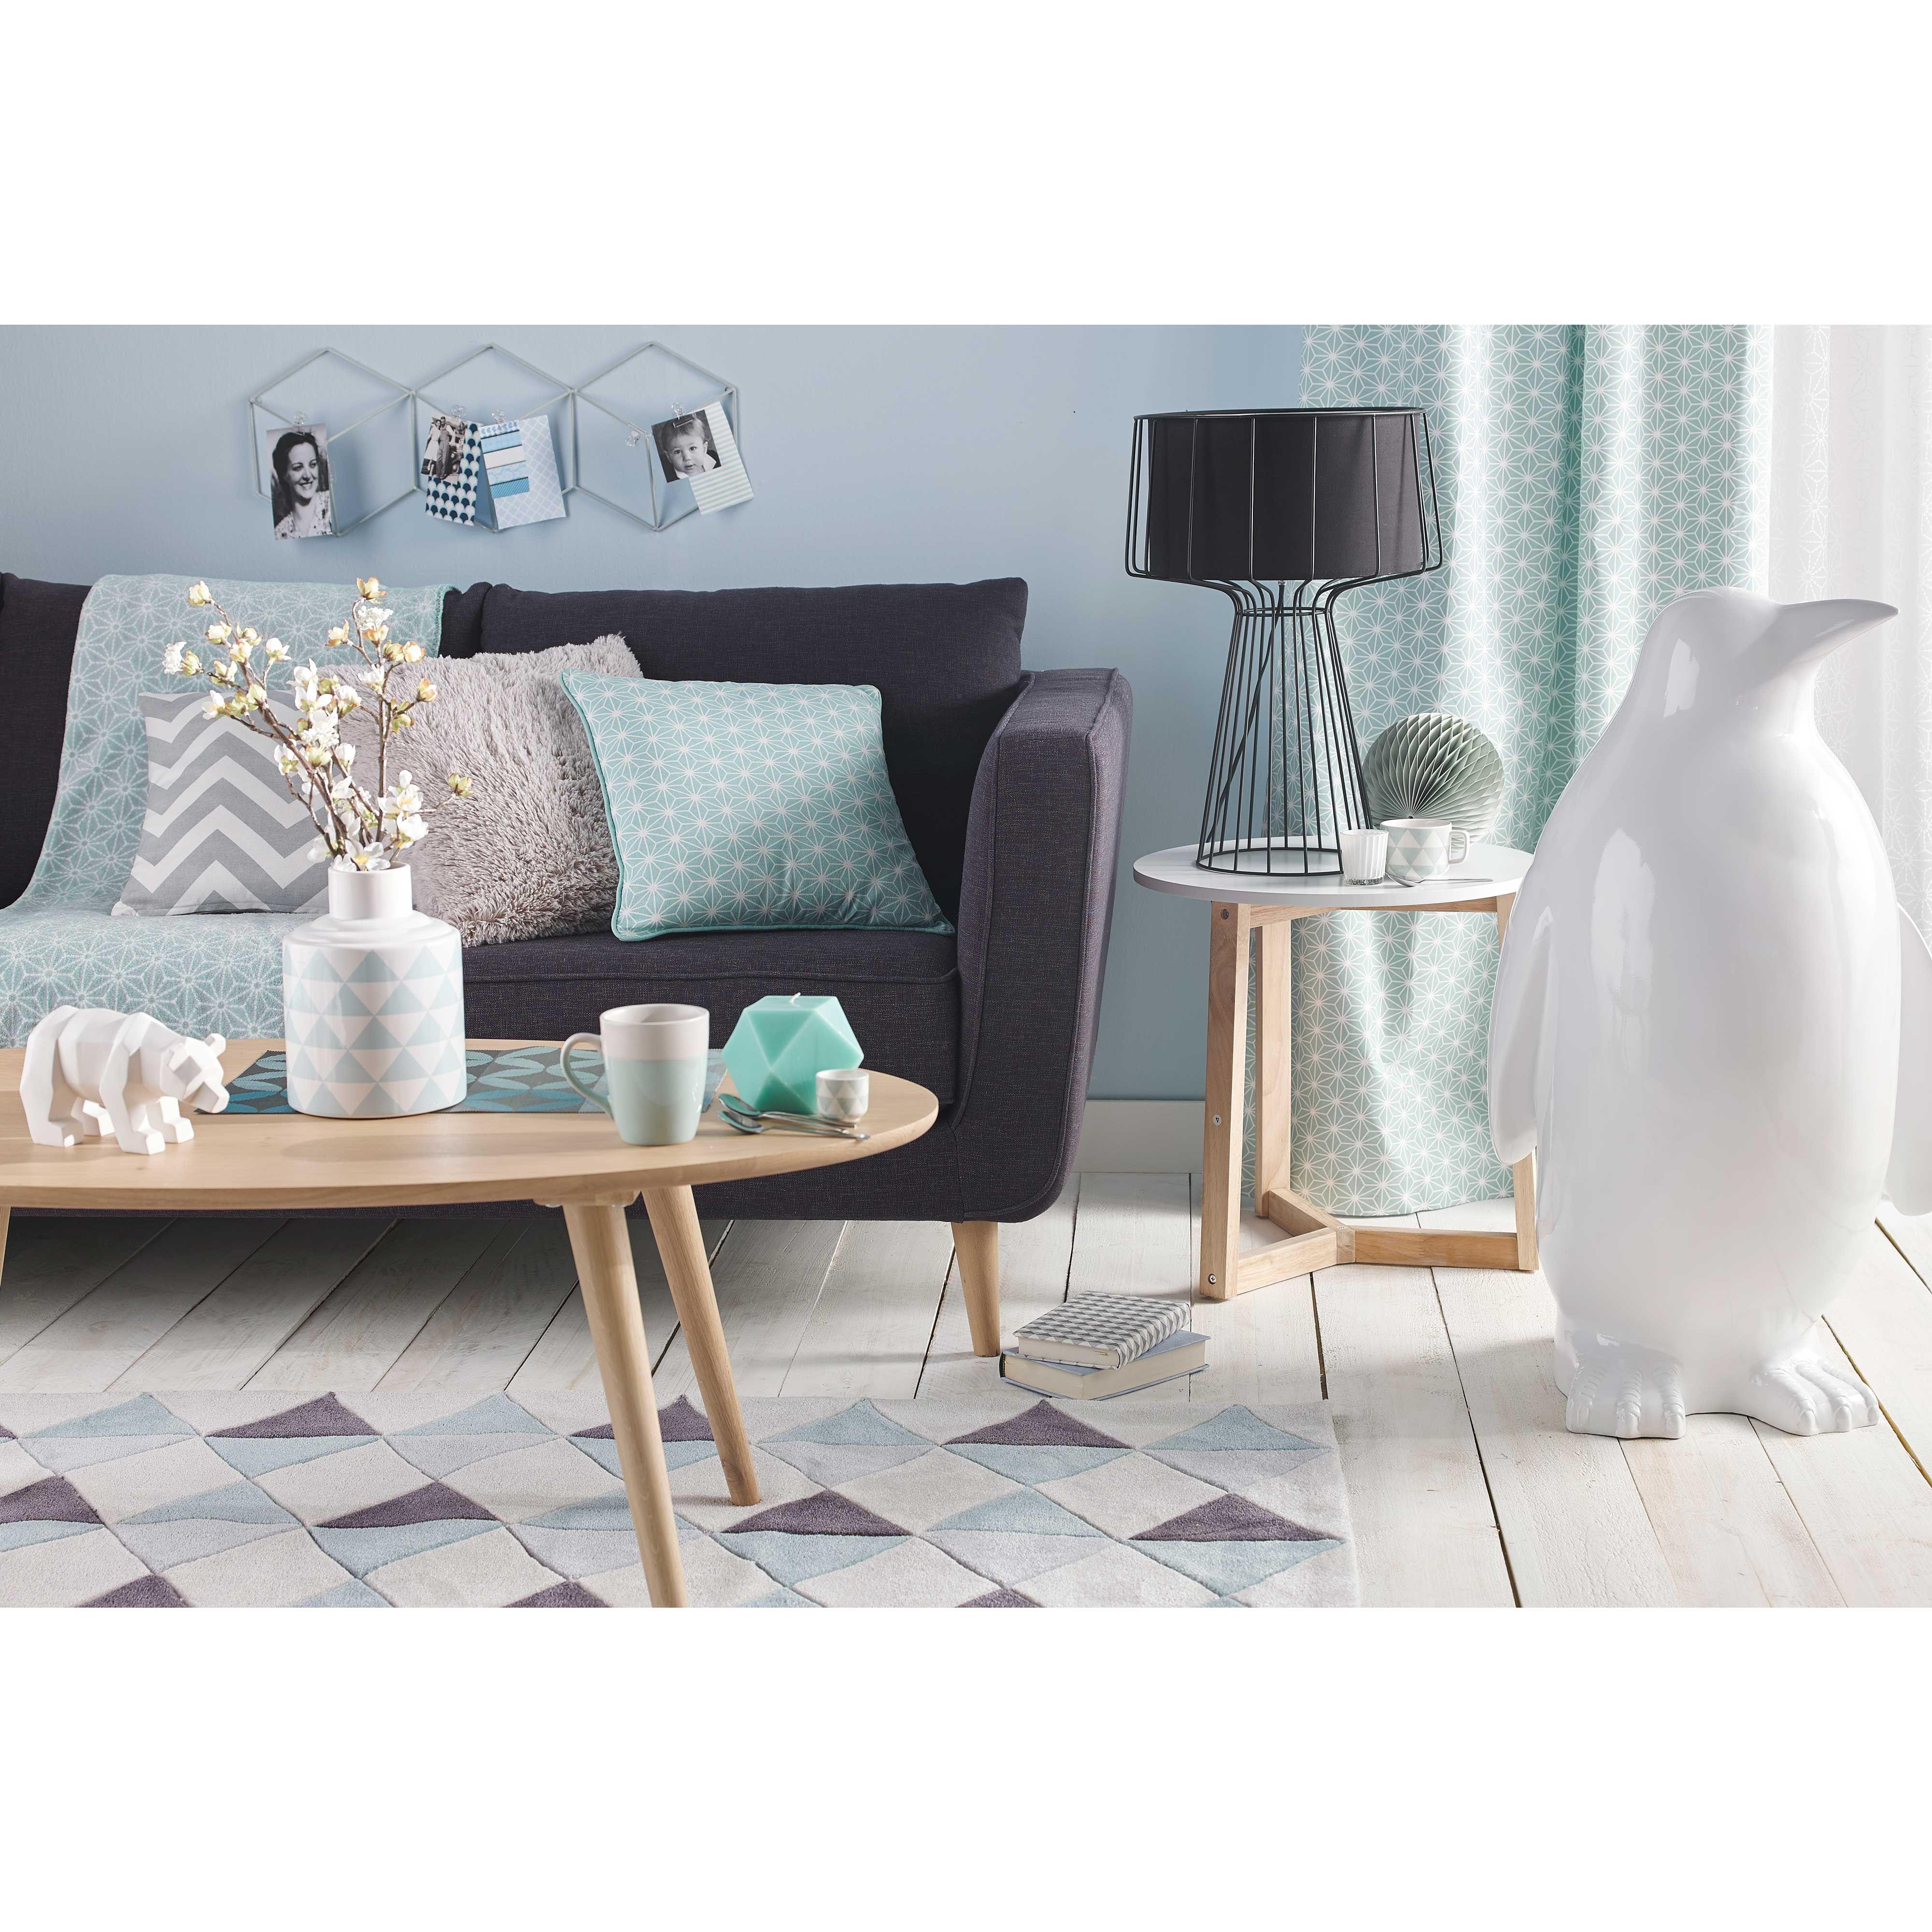 Alfombra Nordic  SalnComedor  LivingDining Room